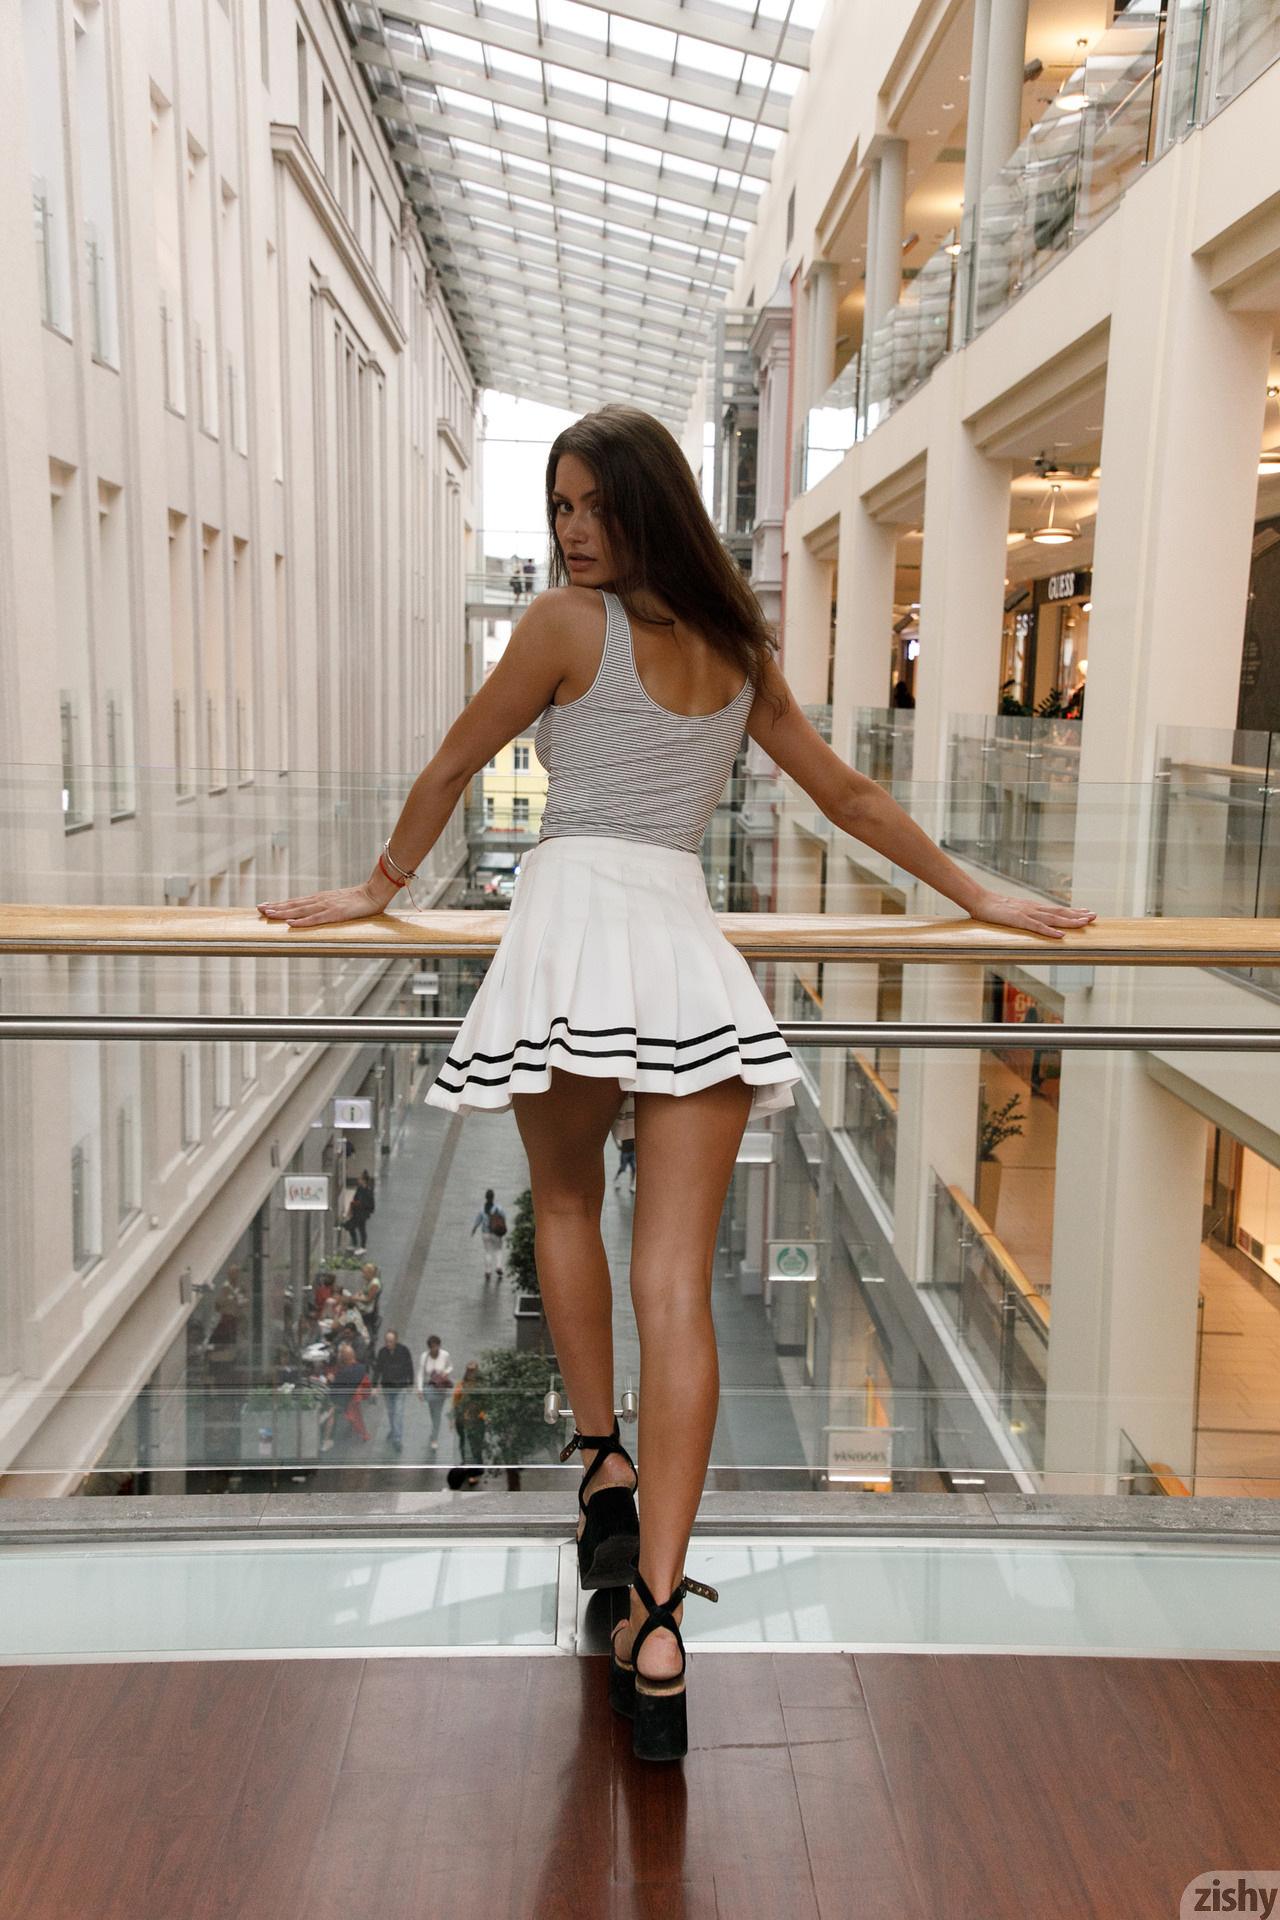 Shyla Volbeck Shopping With The Devil Zishy (52)